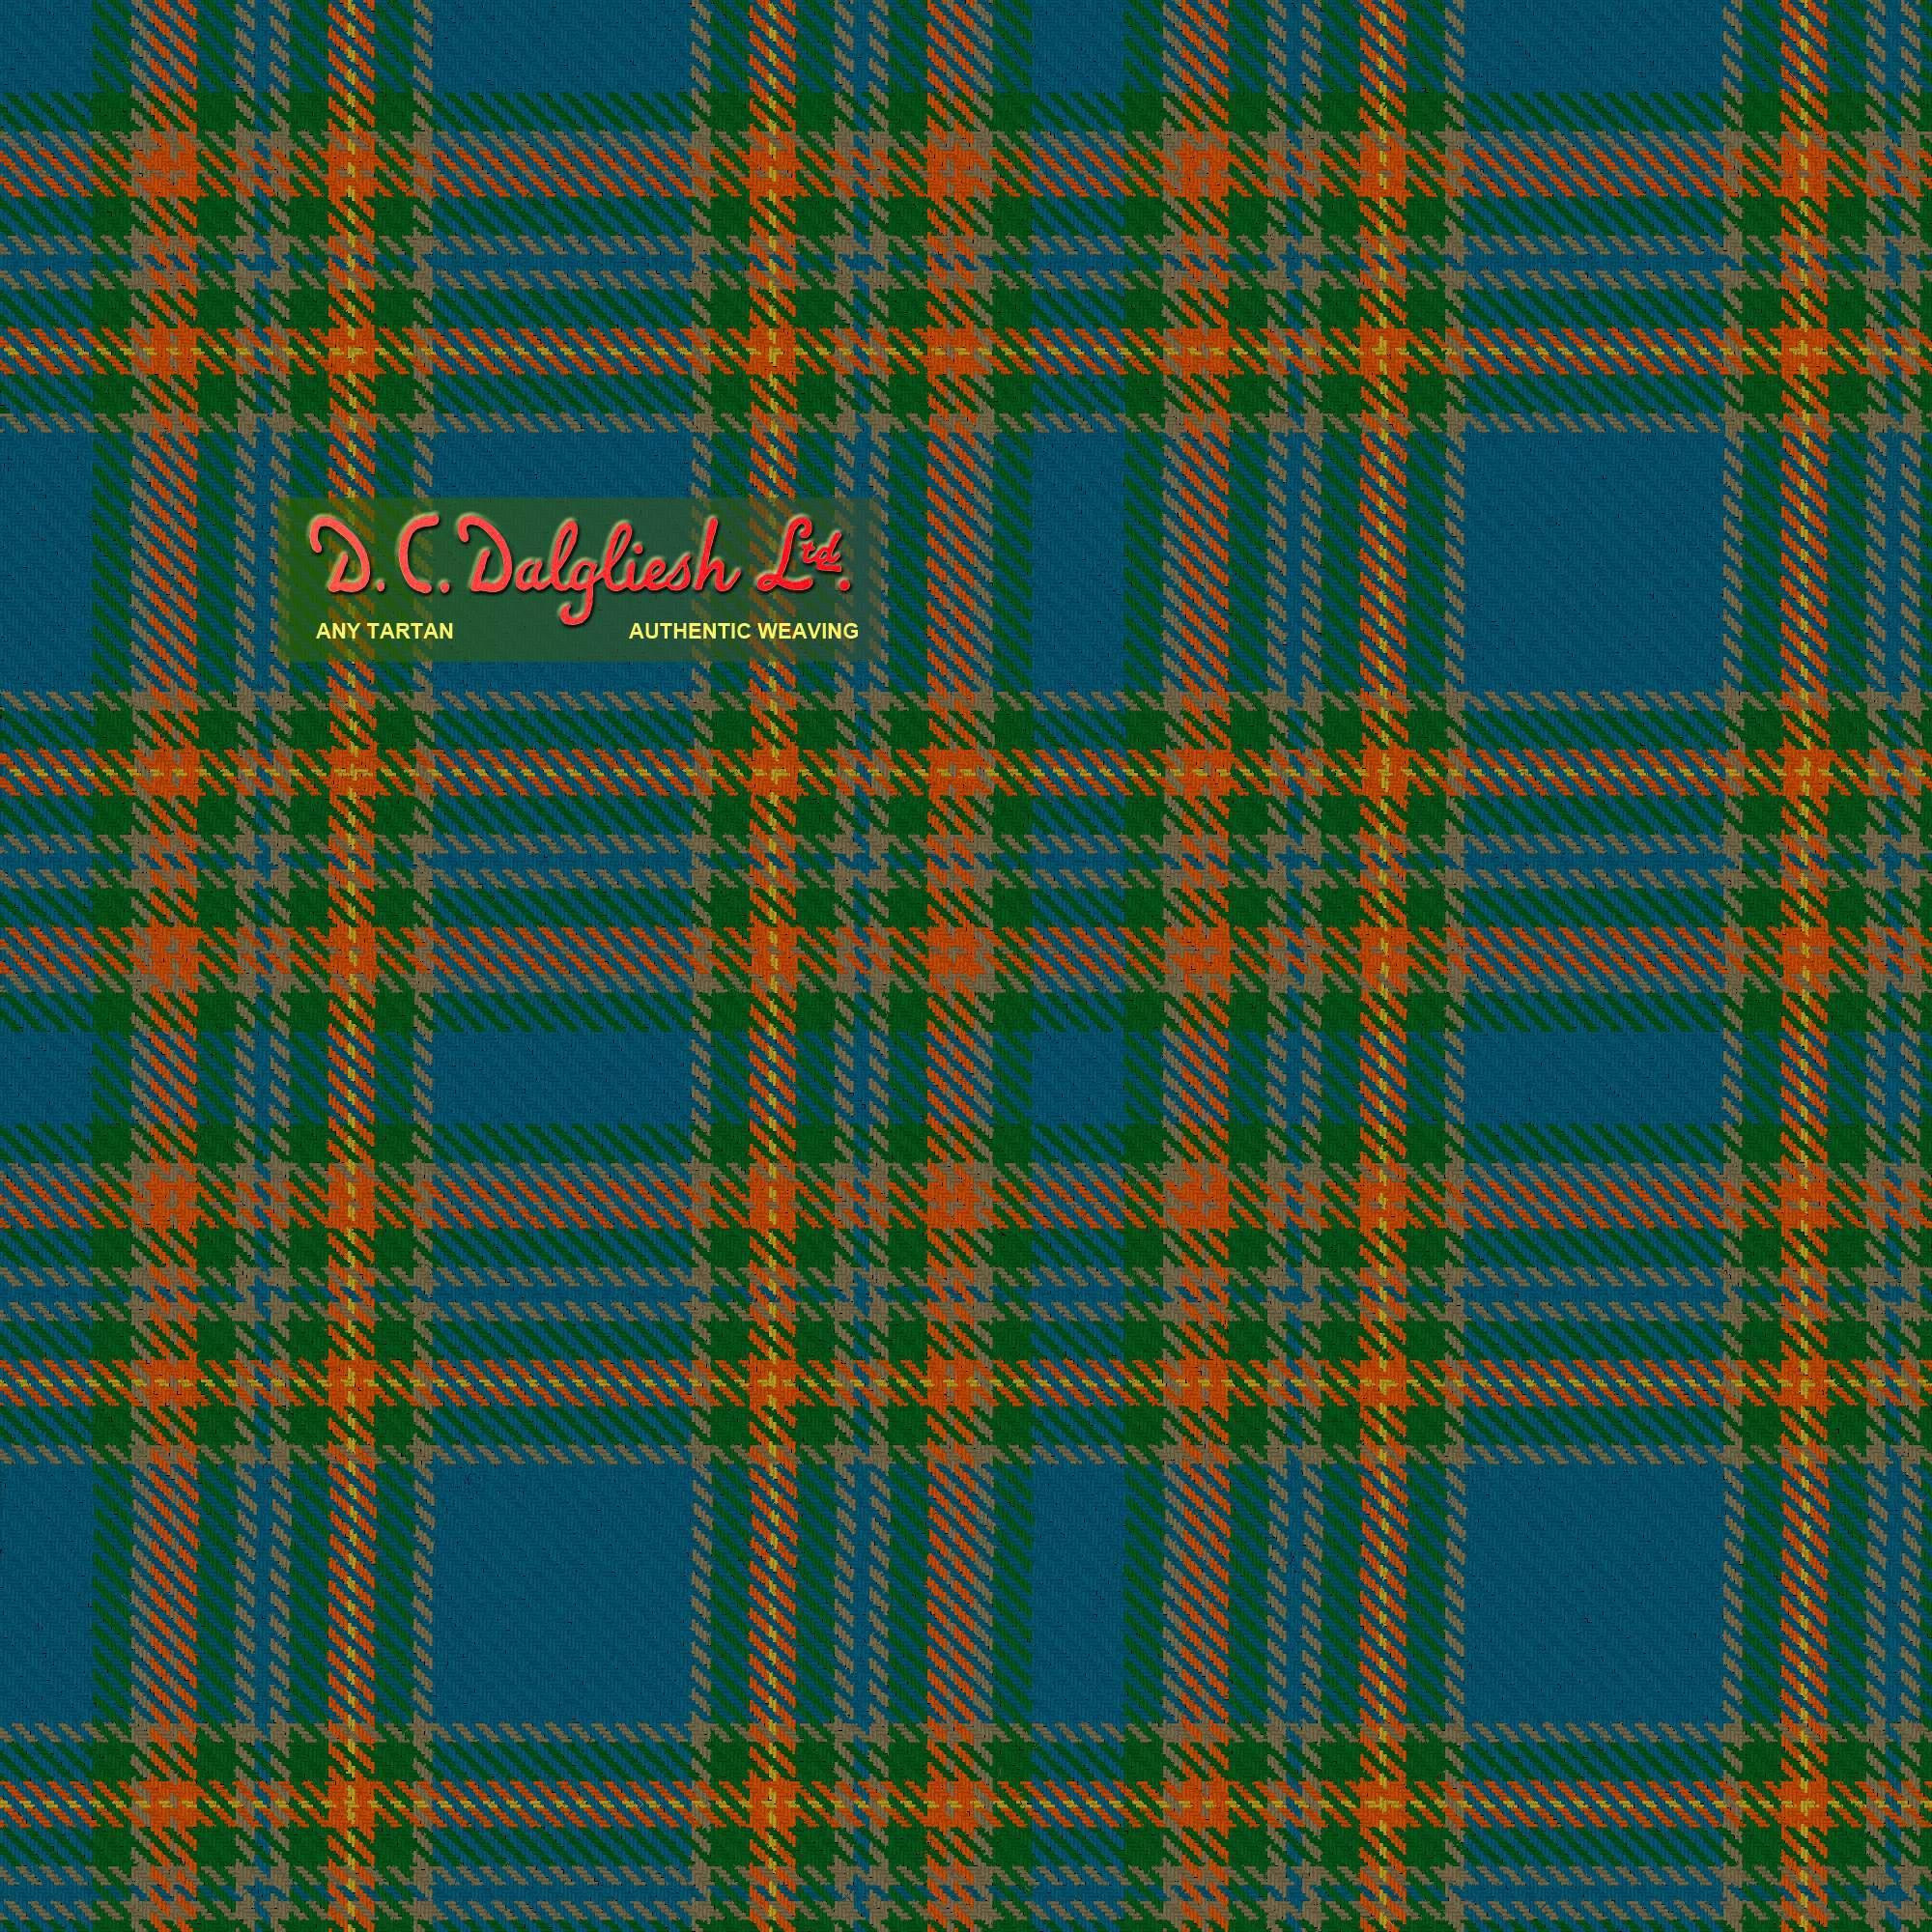 Indianapolis Mpd Emerald Society Fabric By Dc Dalgliesh